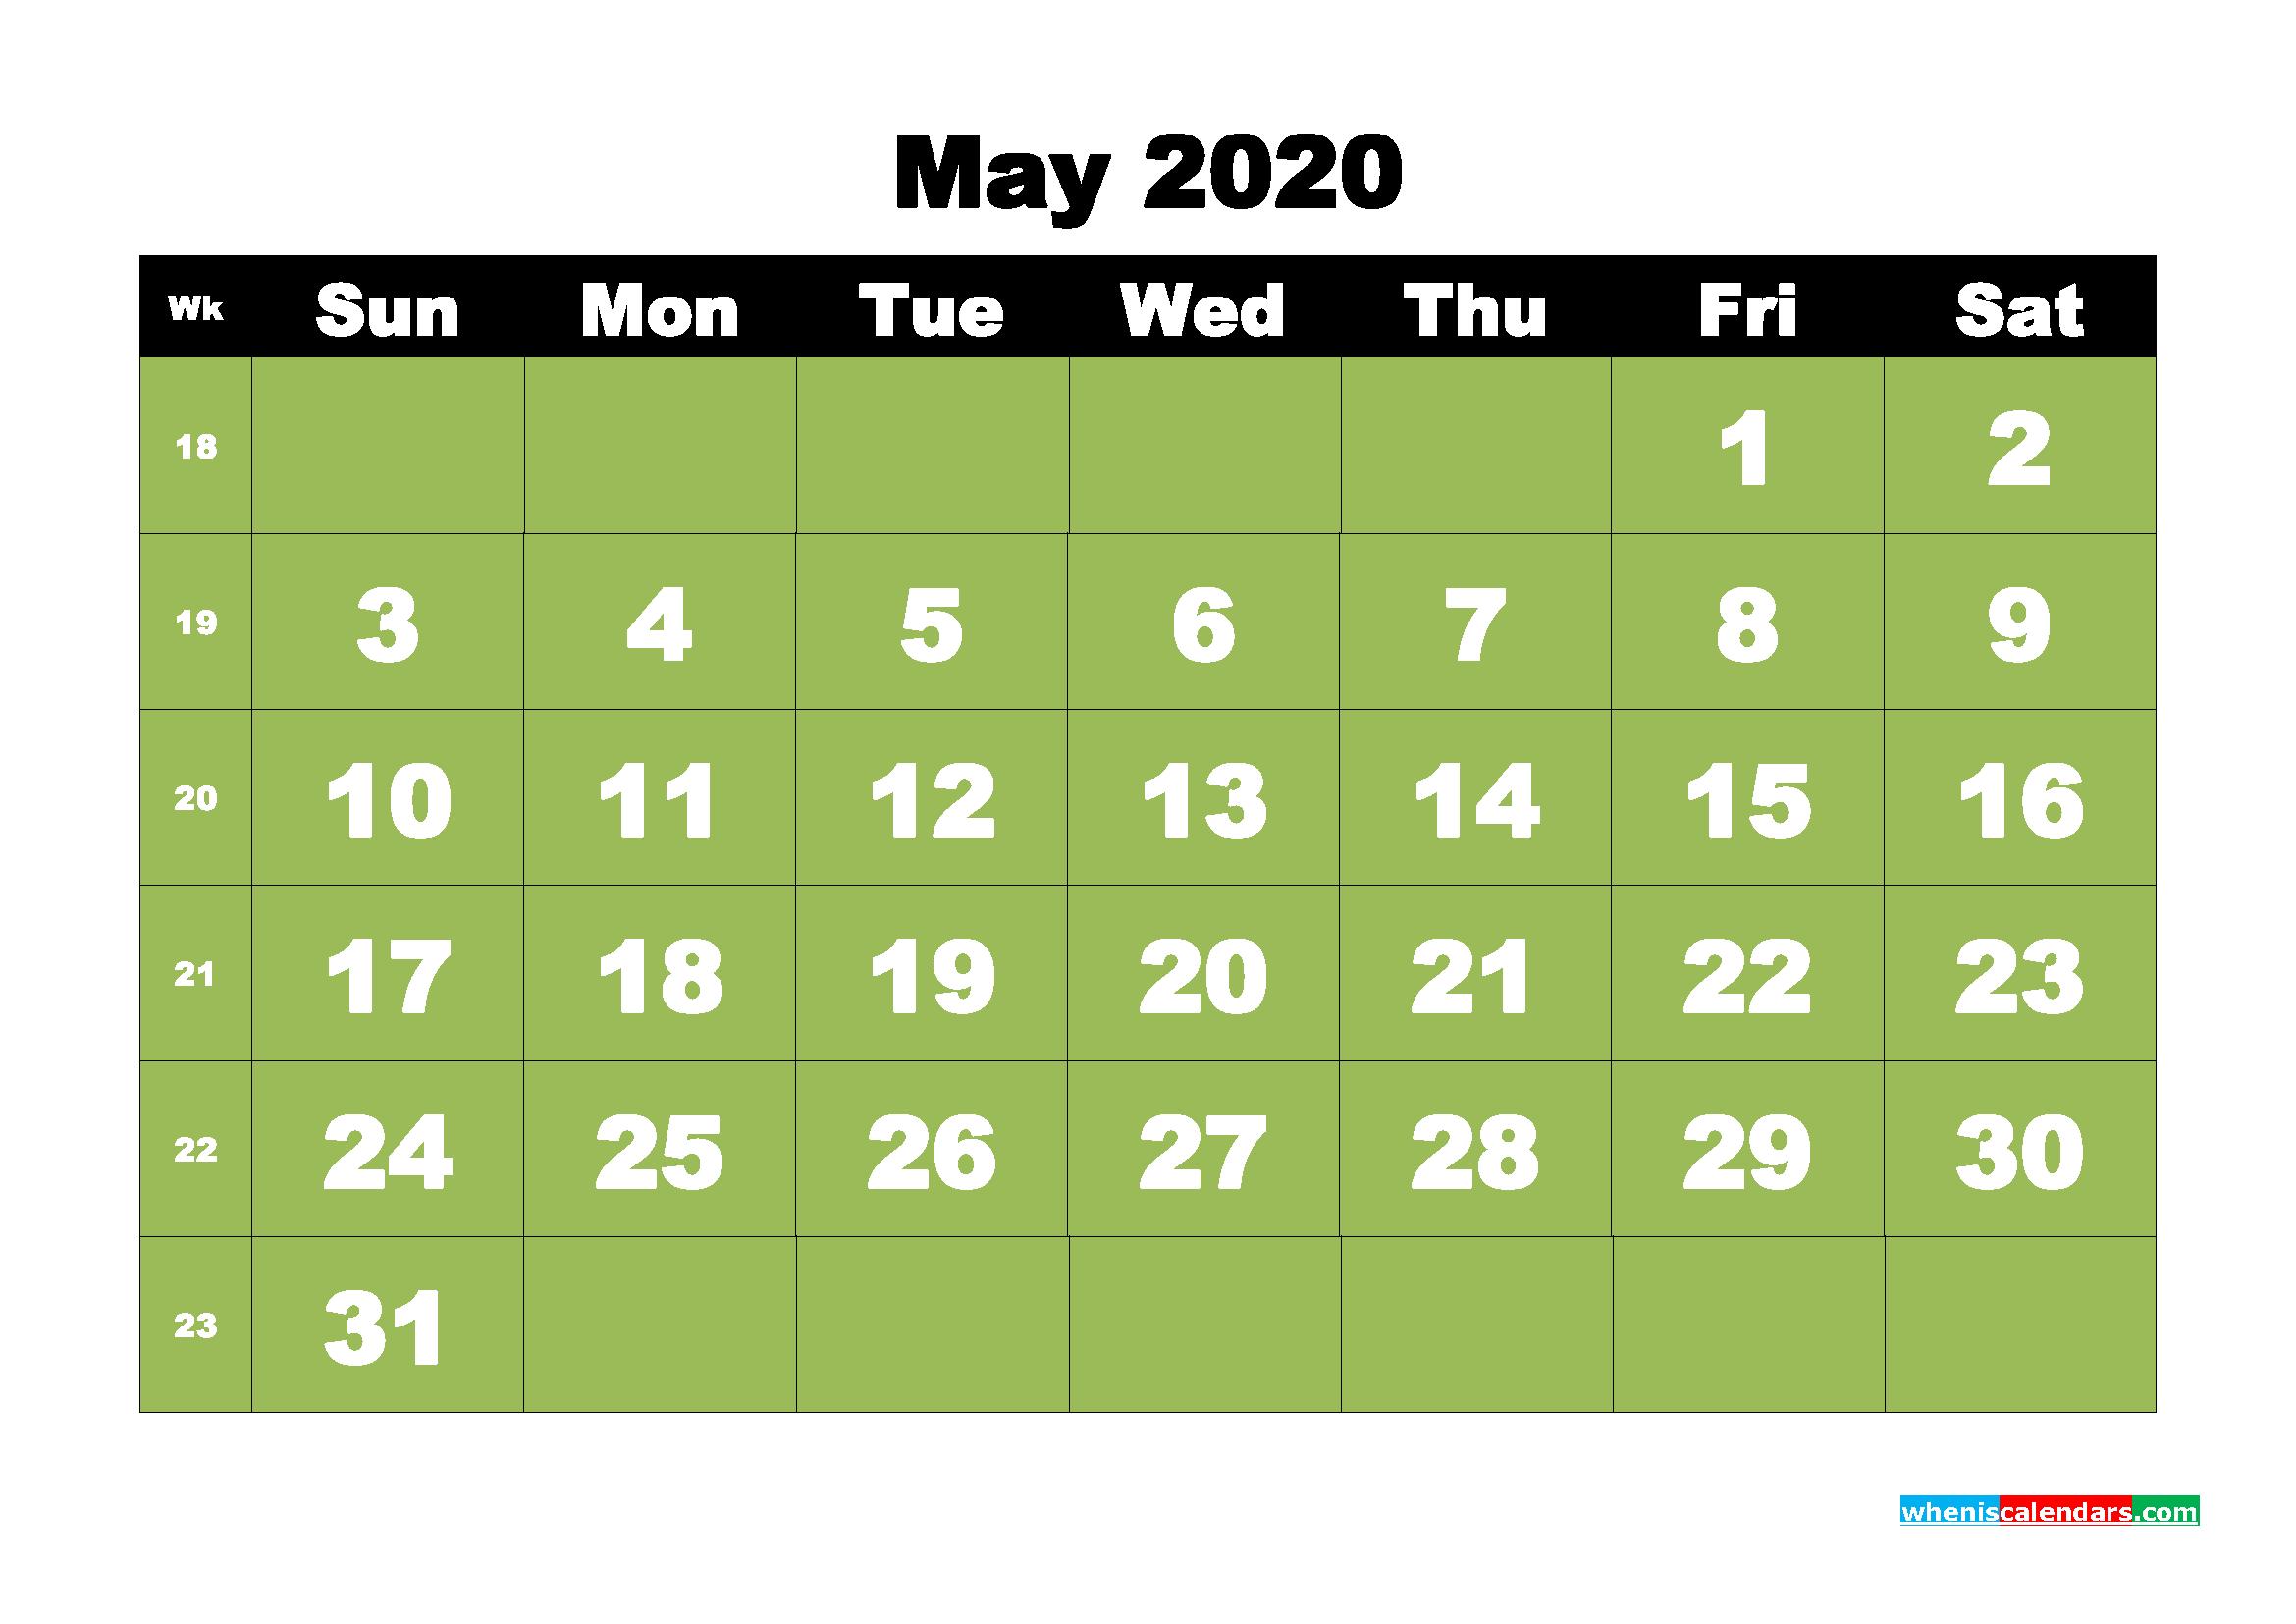 Free Printable May 2020 Calendar - No.m20b29